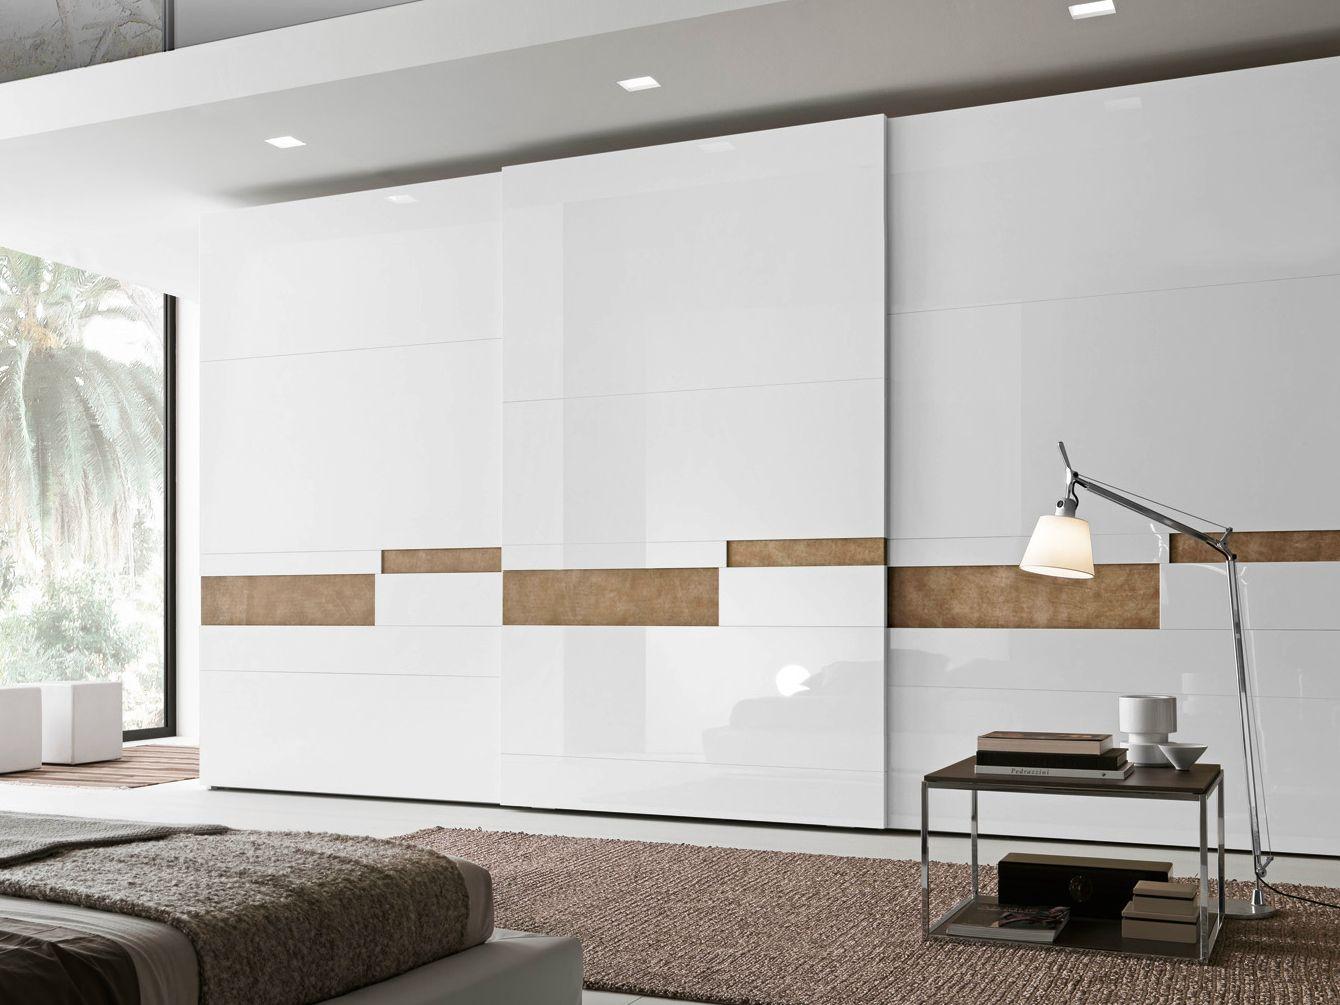 Bedroom Wardrobe Doors Designs Captivating 230 Best Wardrobes  Master Bedroom Images On Pinterest  Bedrooms Design Ideas